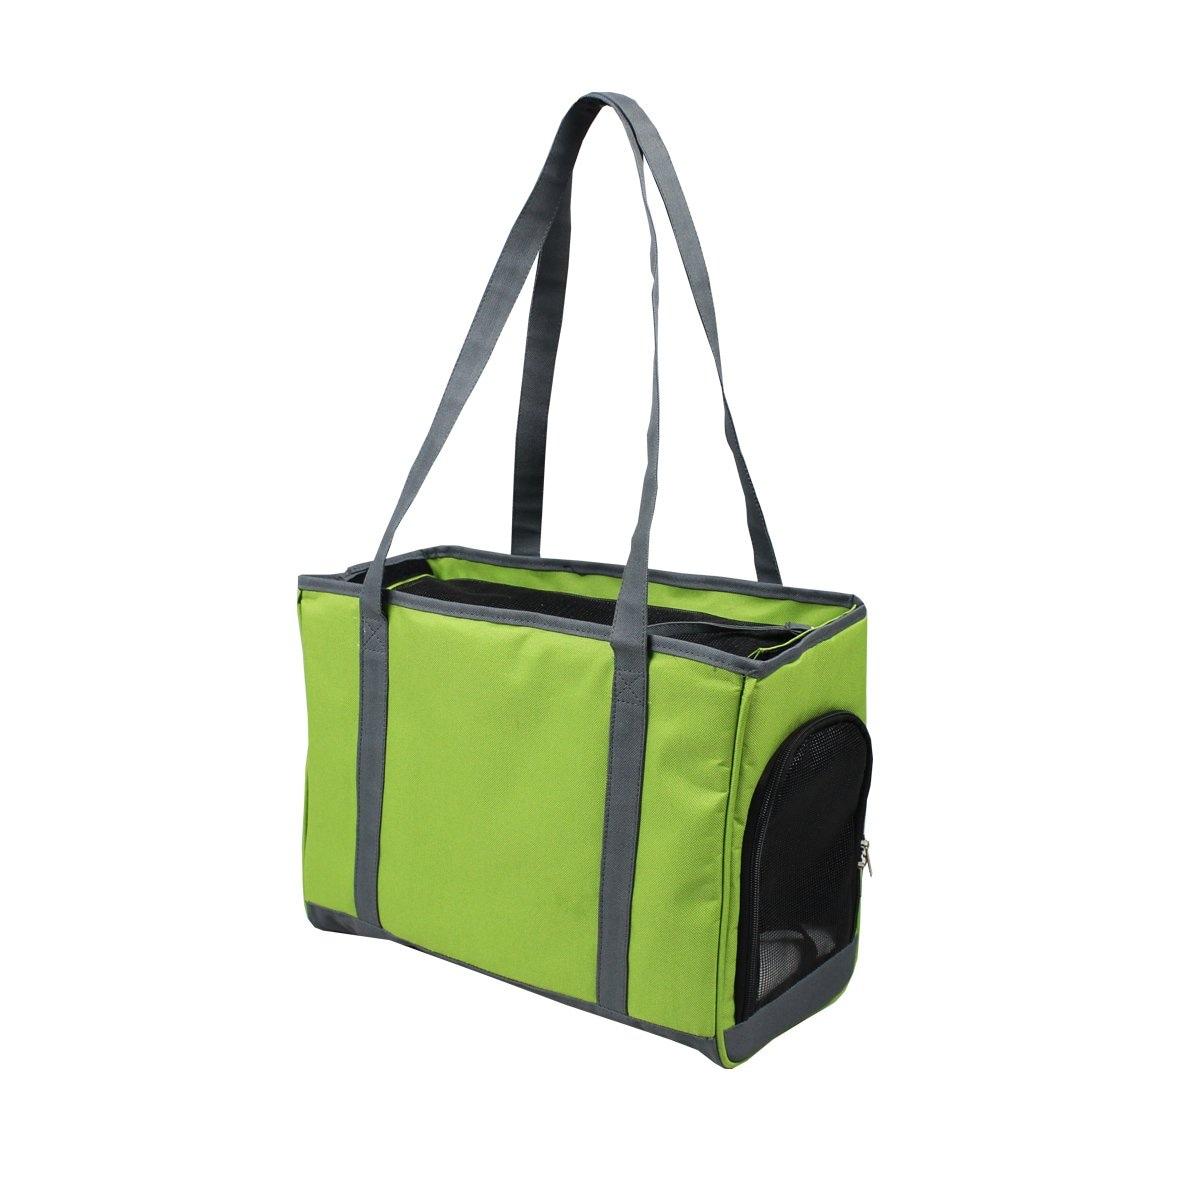 Bolsa de Mano de Tela Verde Fancy Pets Mod. Fl8813